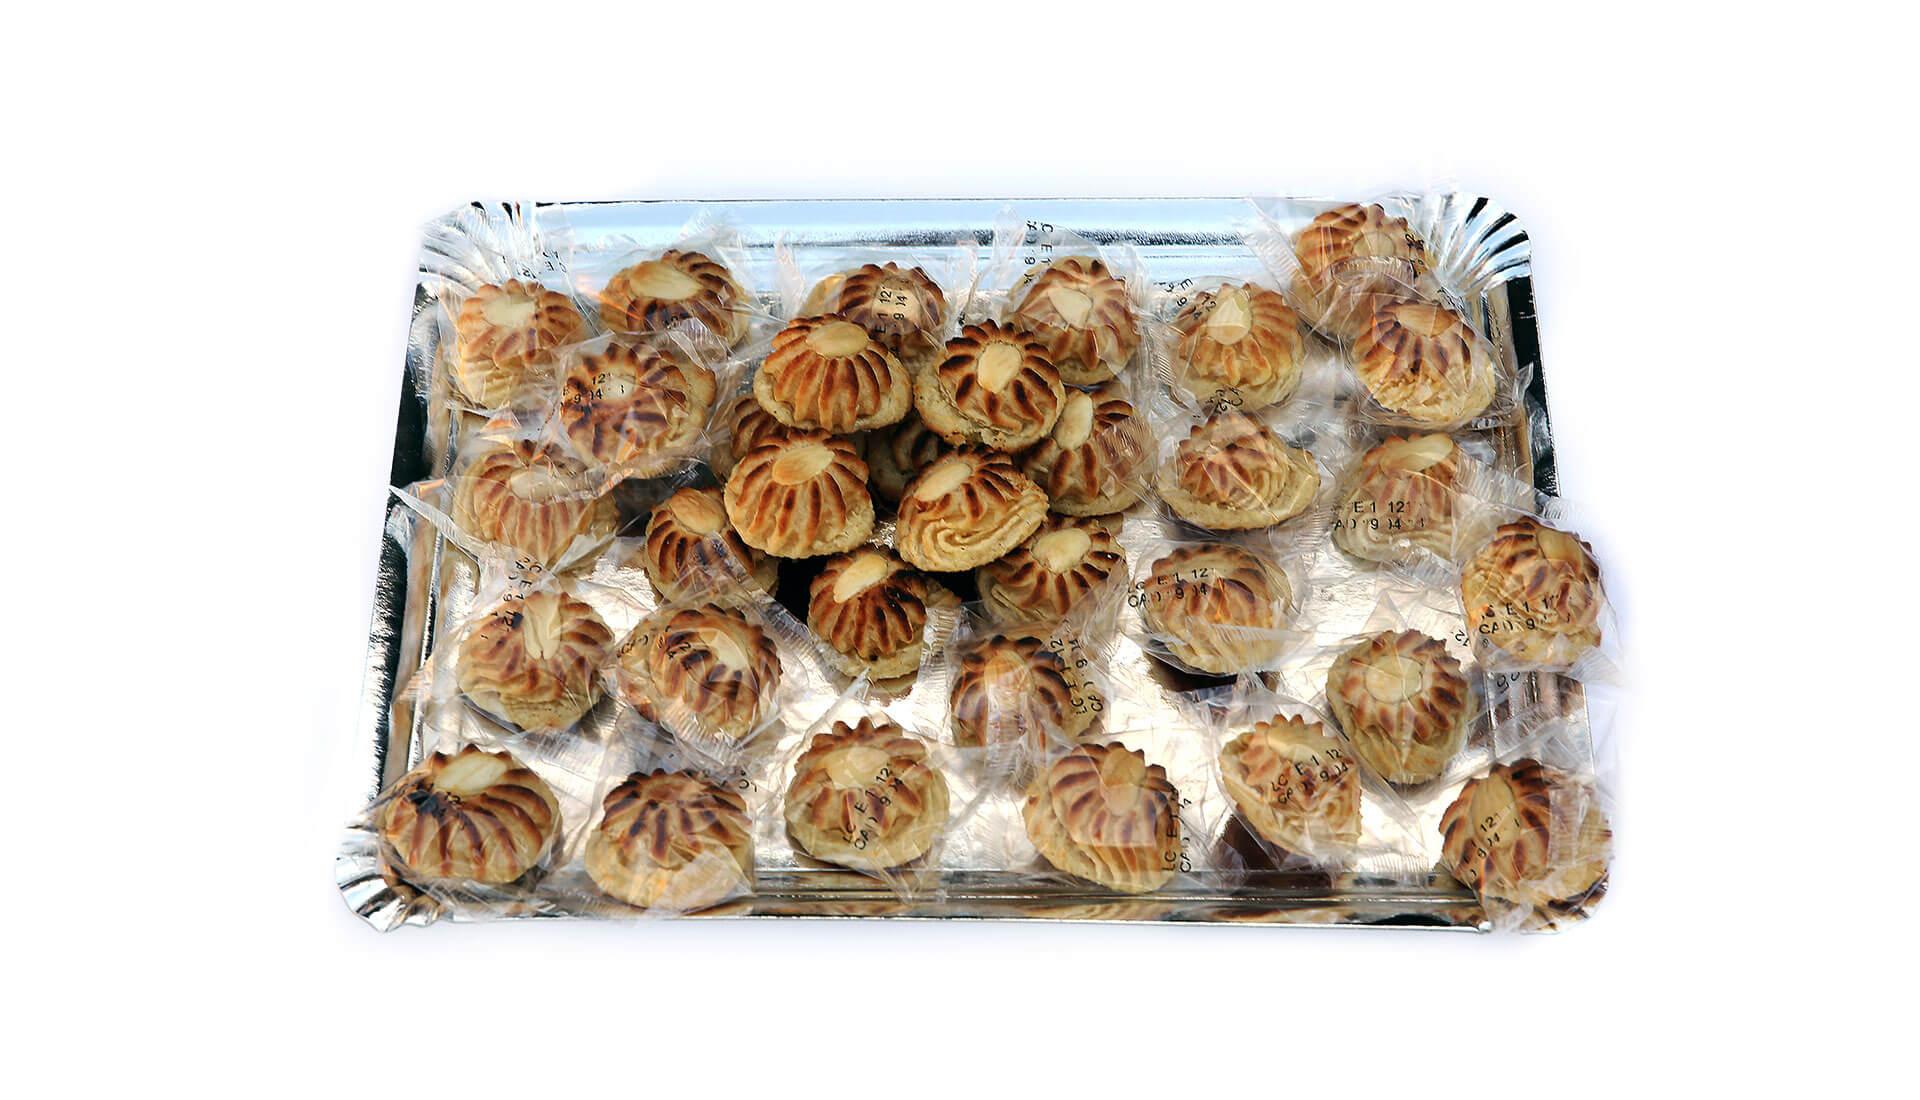 Dulces-San-Francisco_Pasta-de-almendra